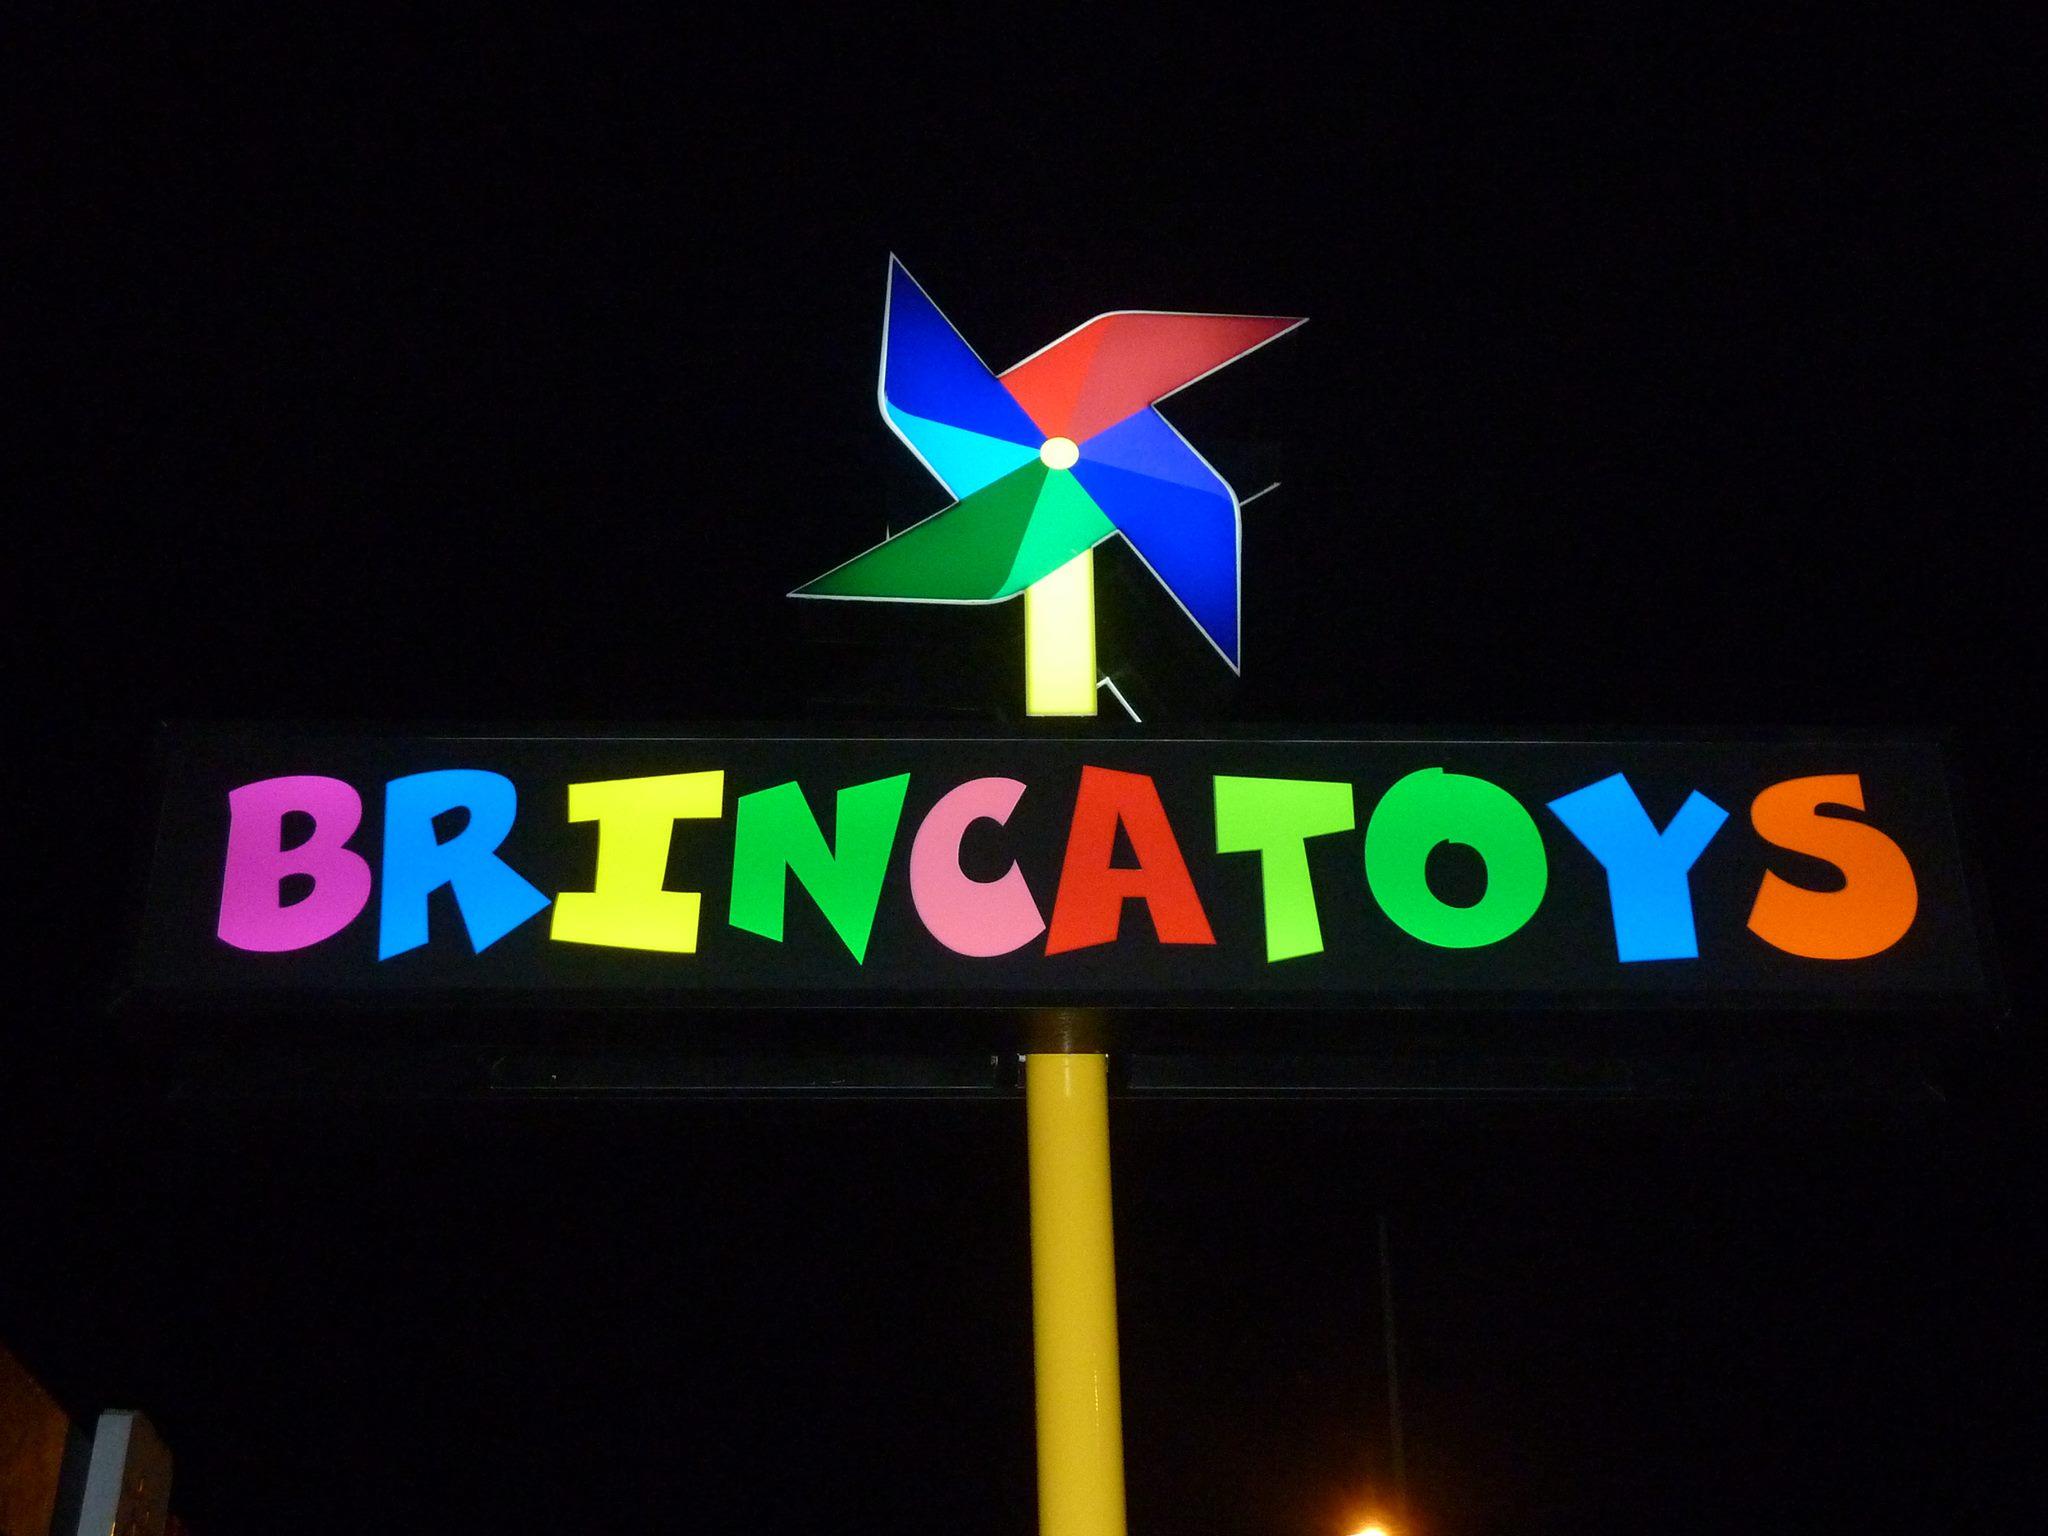 Brincatoys